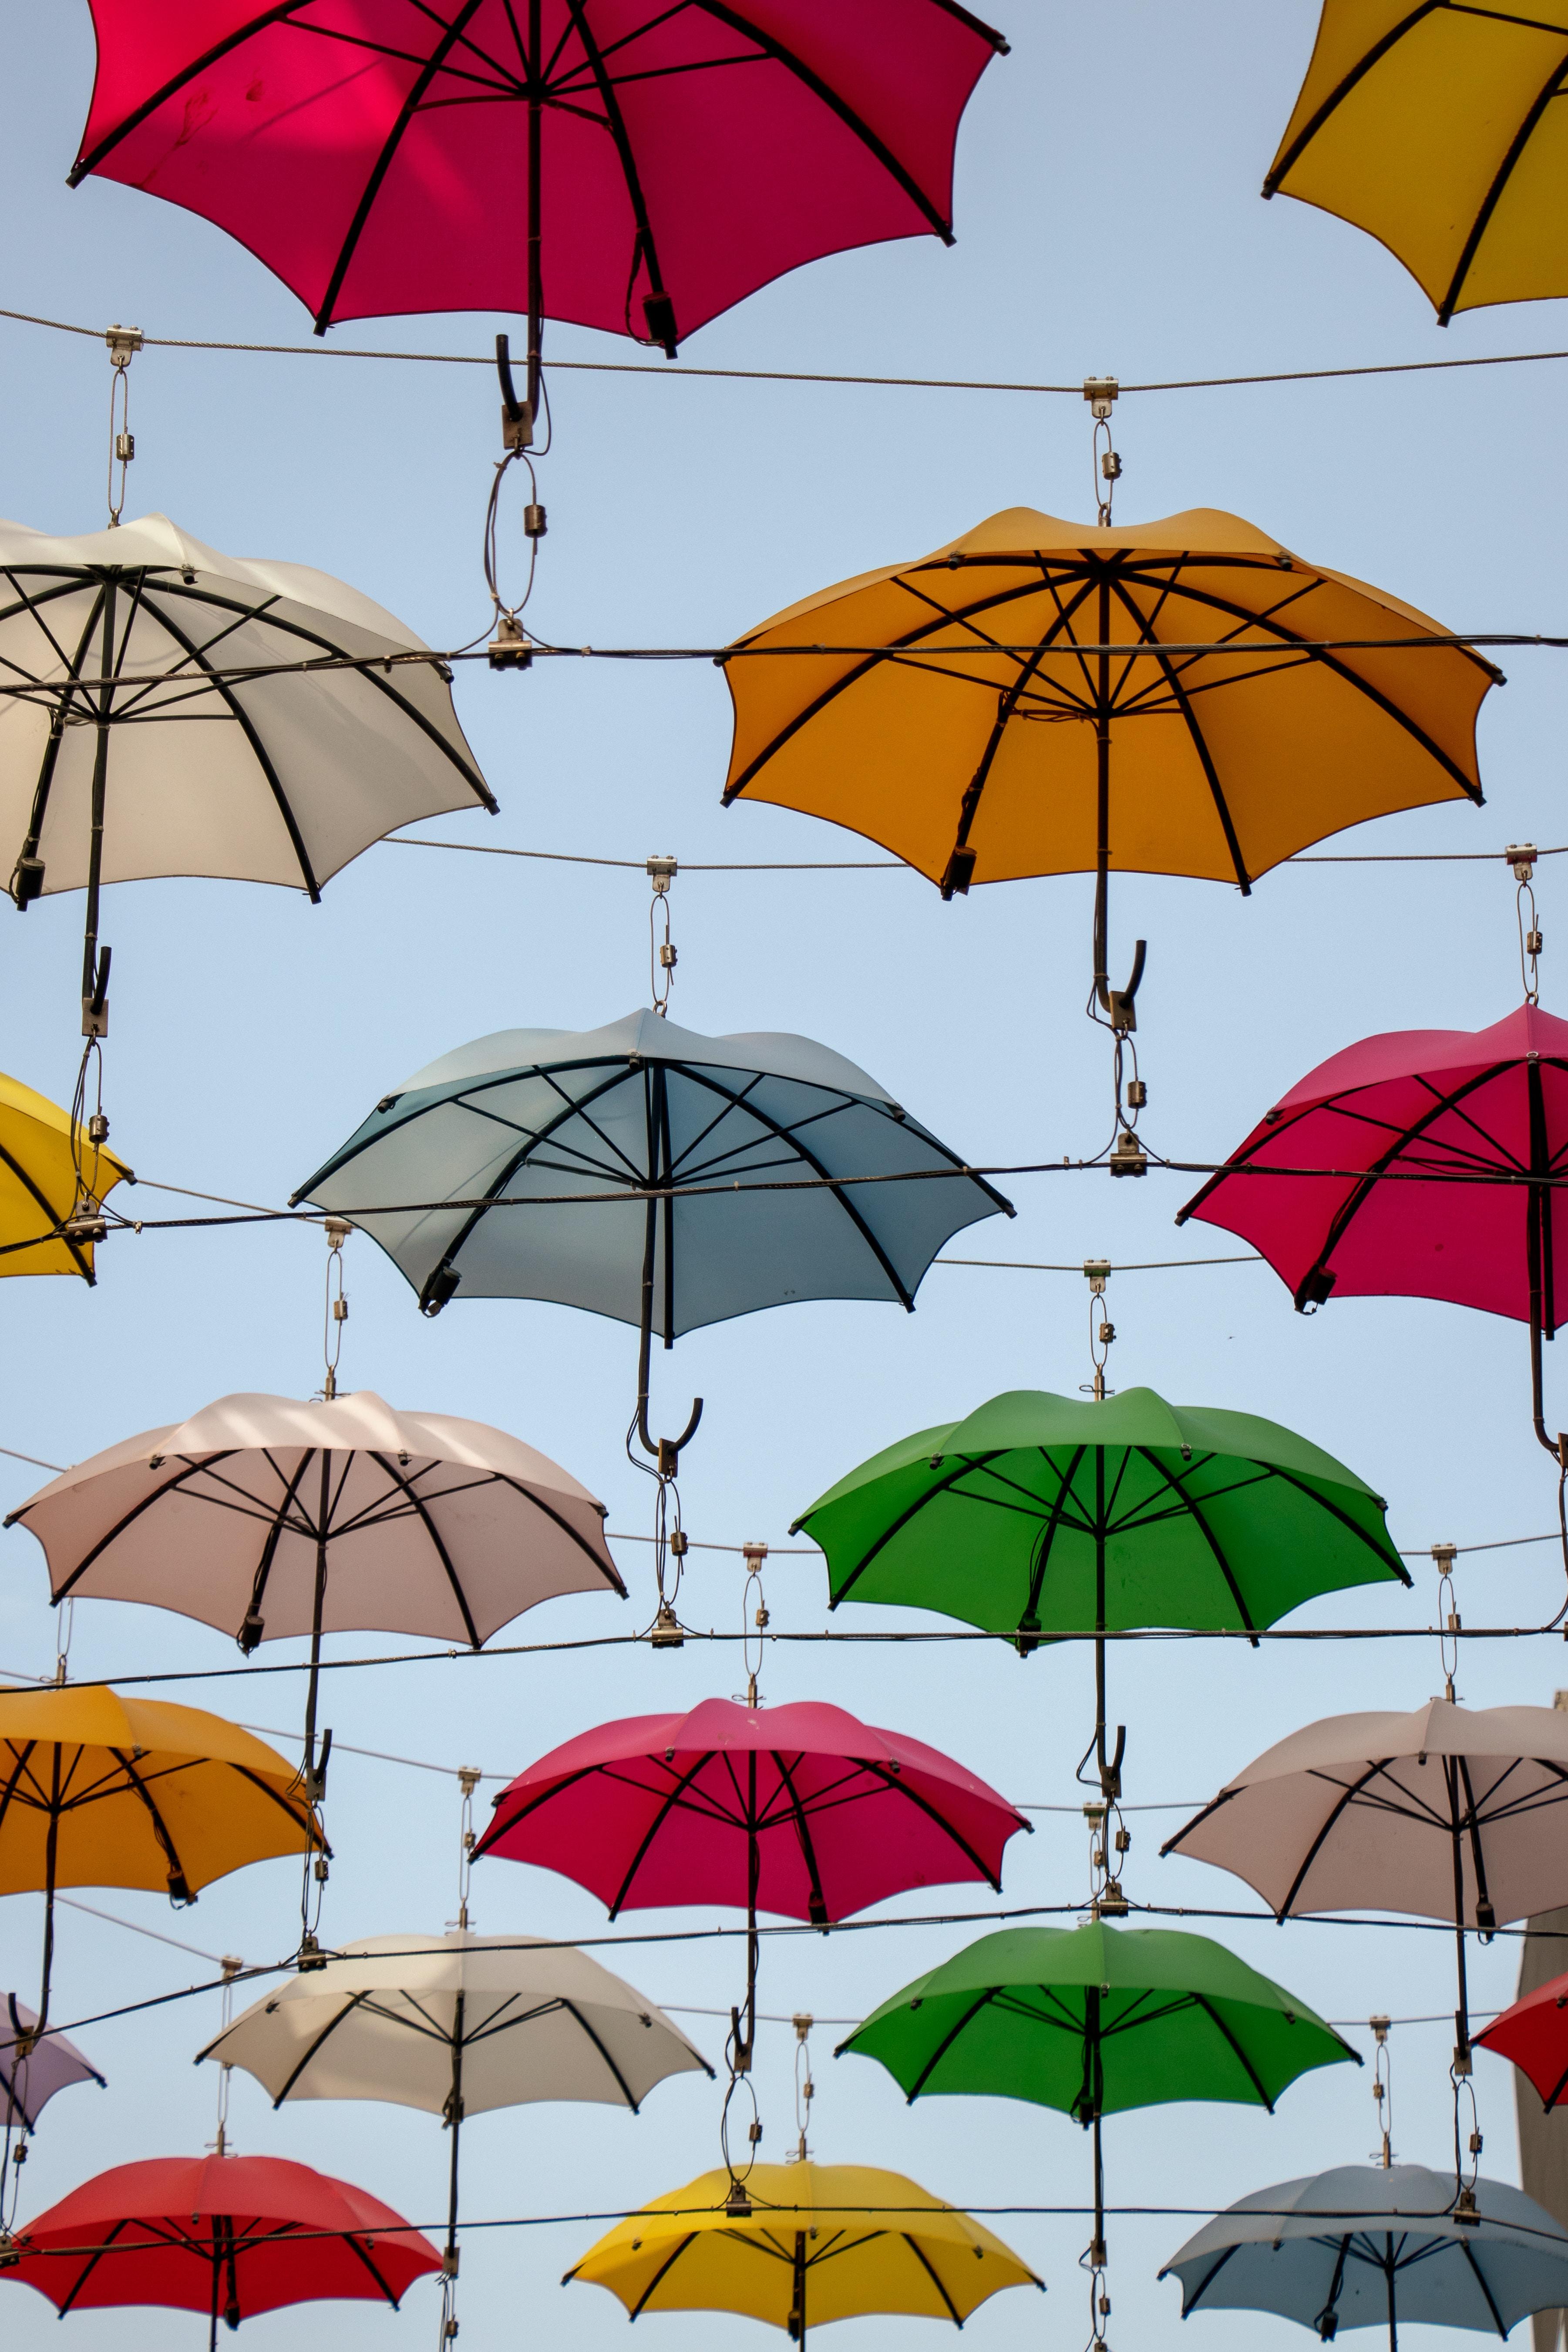 assorted-color umbrellas hanging